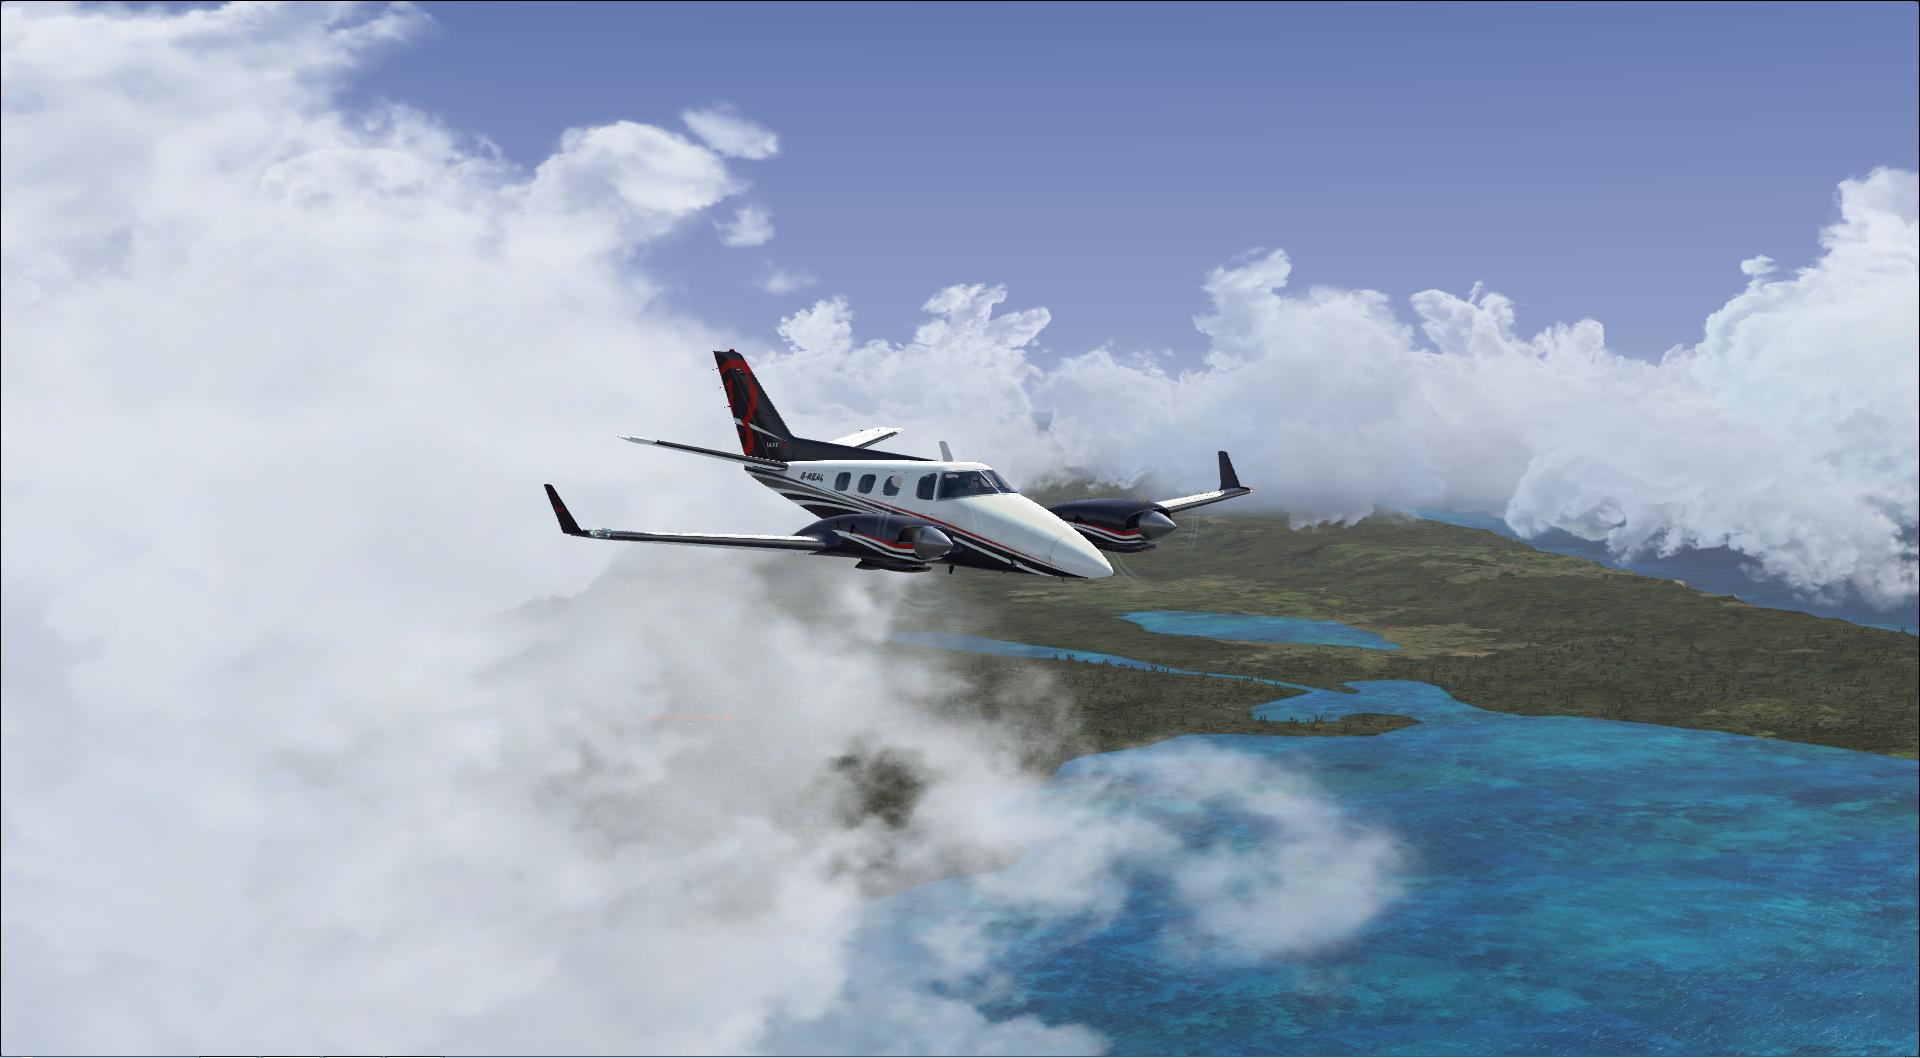 vol australie VFR Bundaberg à Brisbane Intls 6293692013121921481486